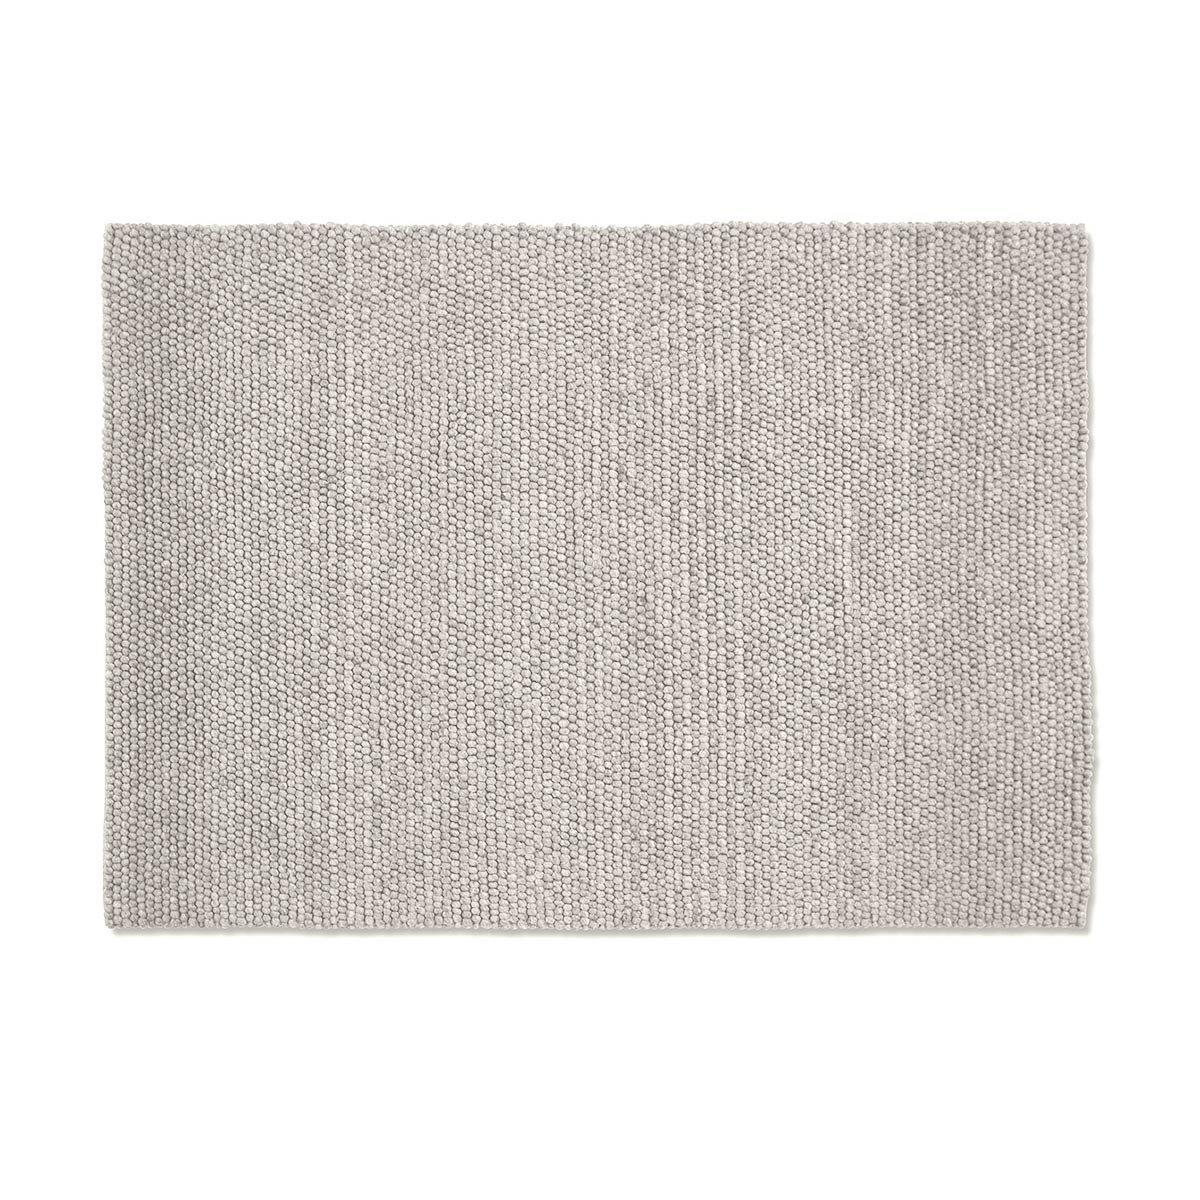 HAY - Peas Teppich 140 x 200 cm, Soft Grau